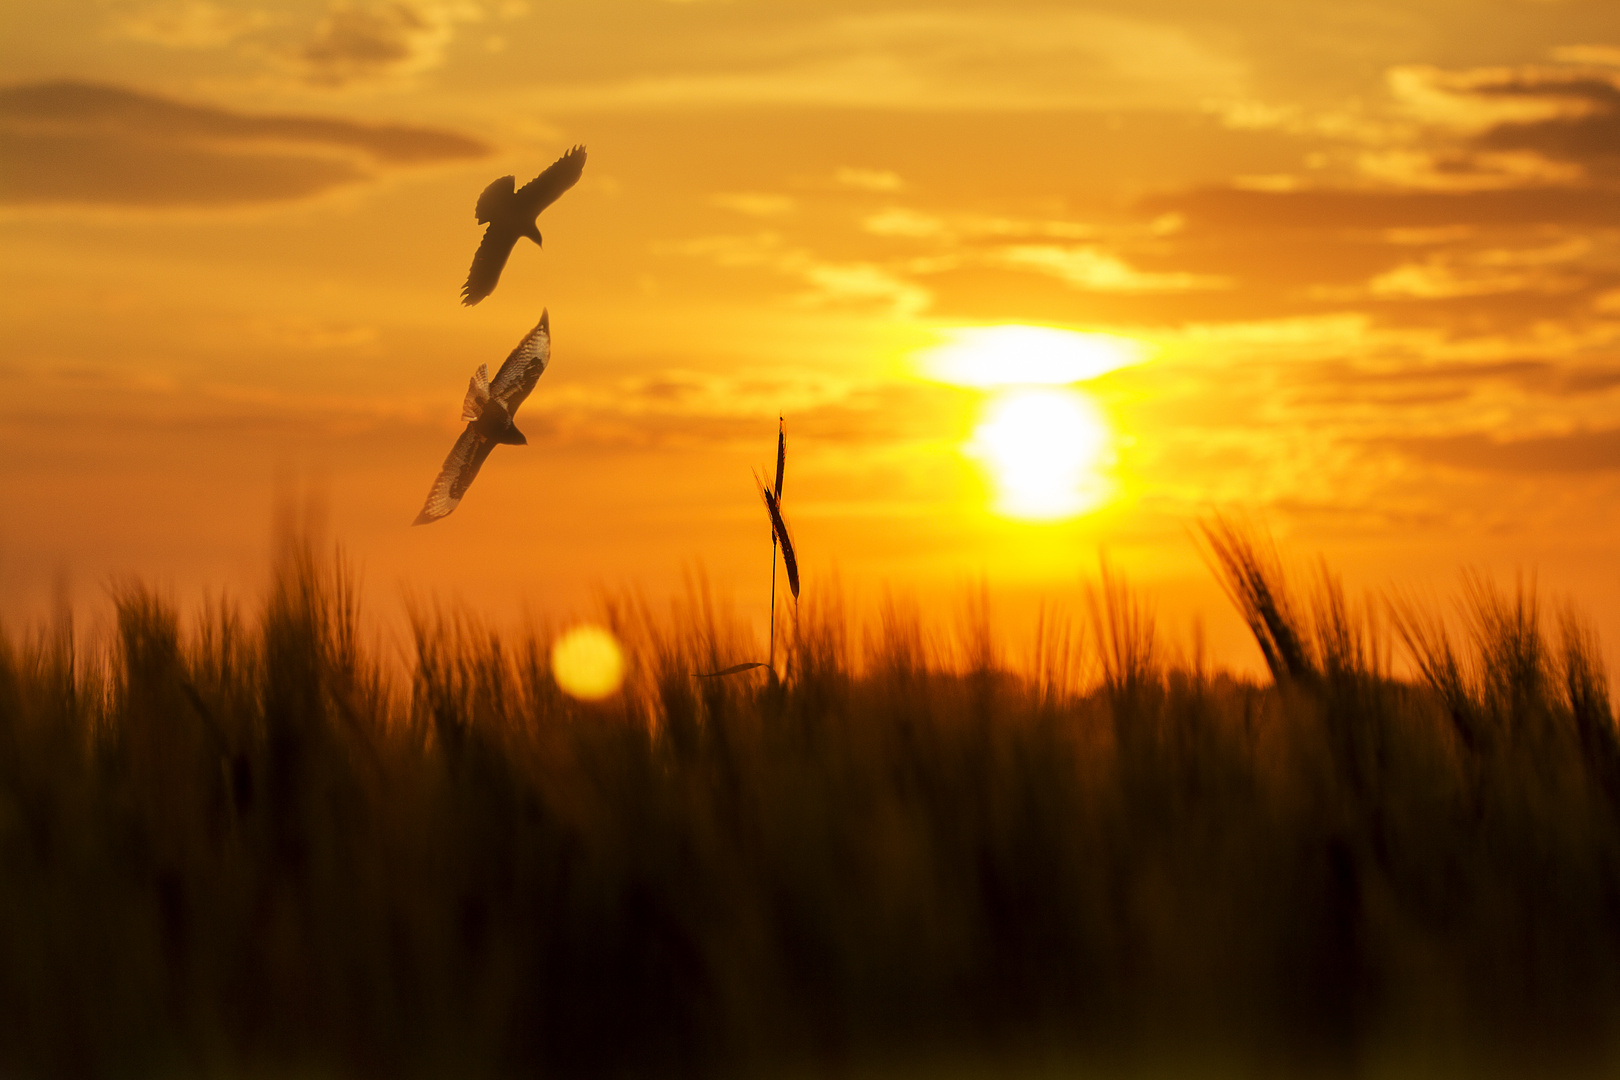 Tiefflug in den Sonnenuntergang